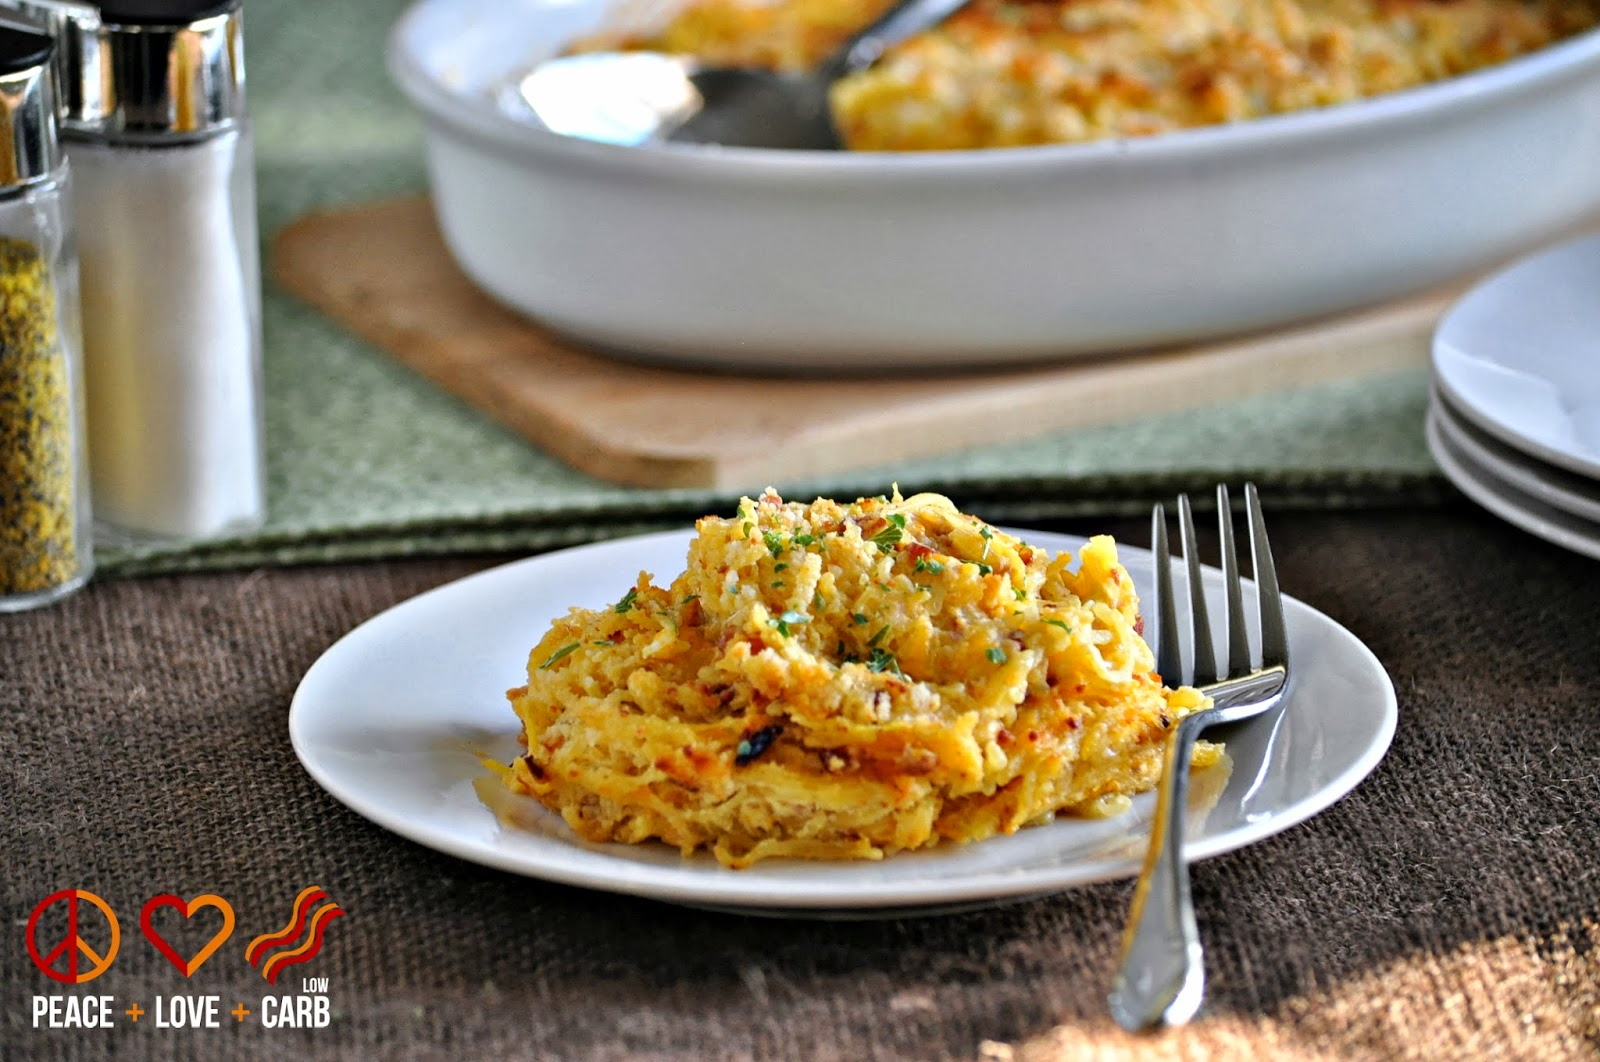 Spaghetti Squash Au Gratin with Bacon – Low Carb, Gluten Free